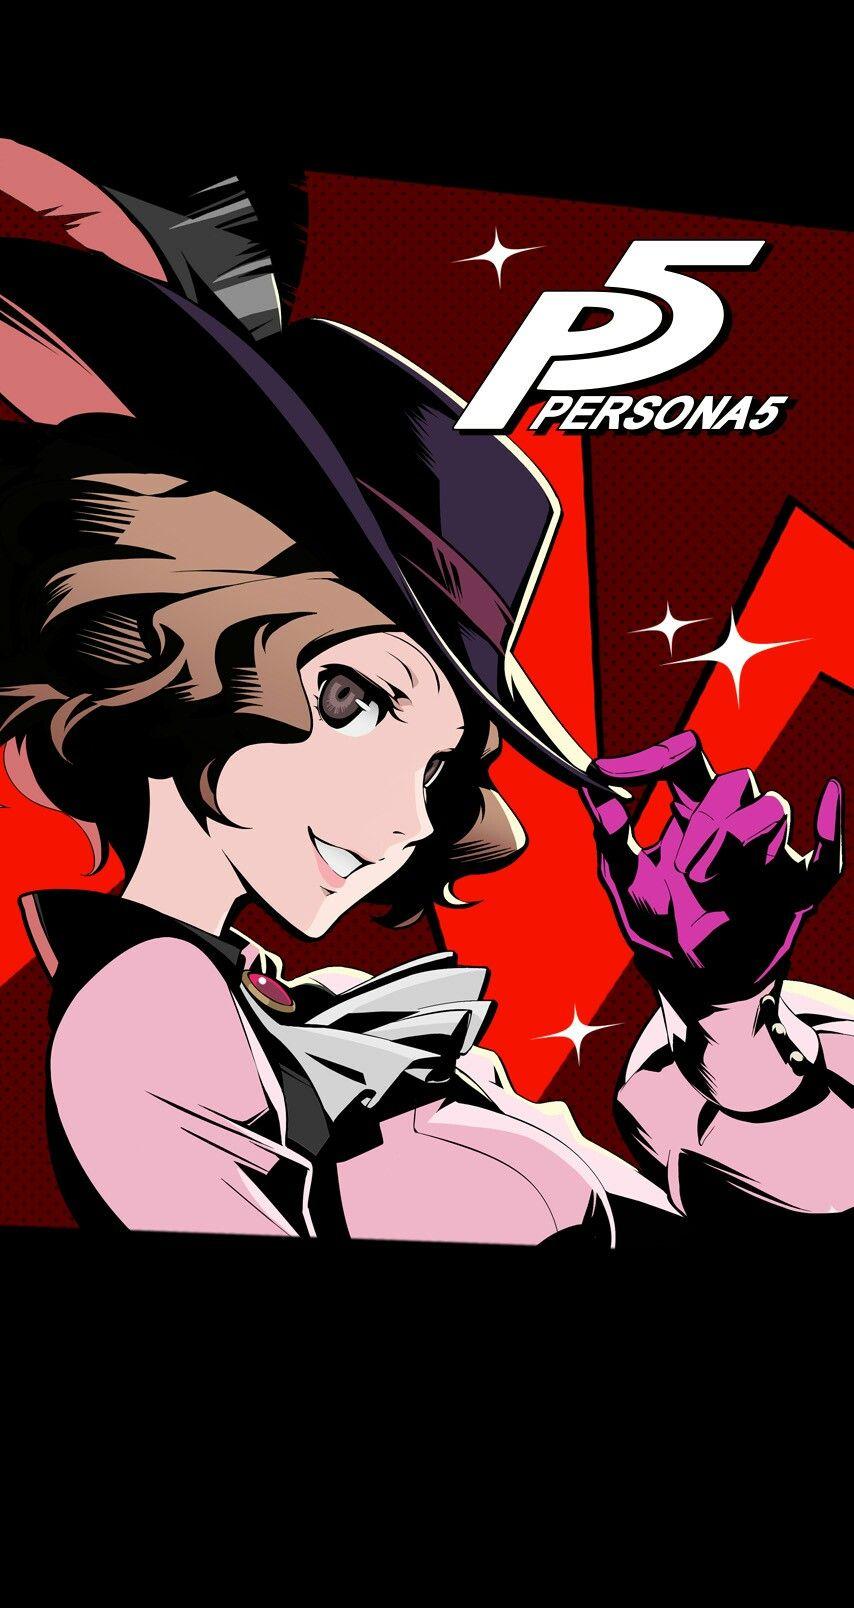 Persona 5 haru okumura wallpaper persona 5 anime